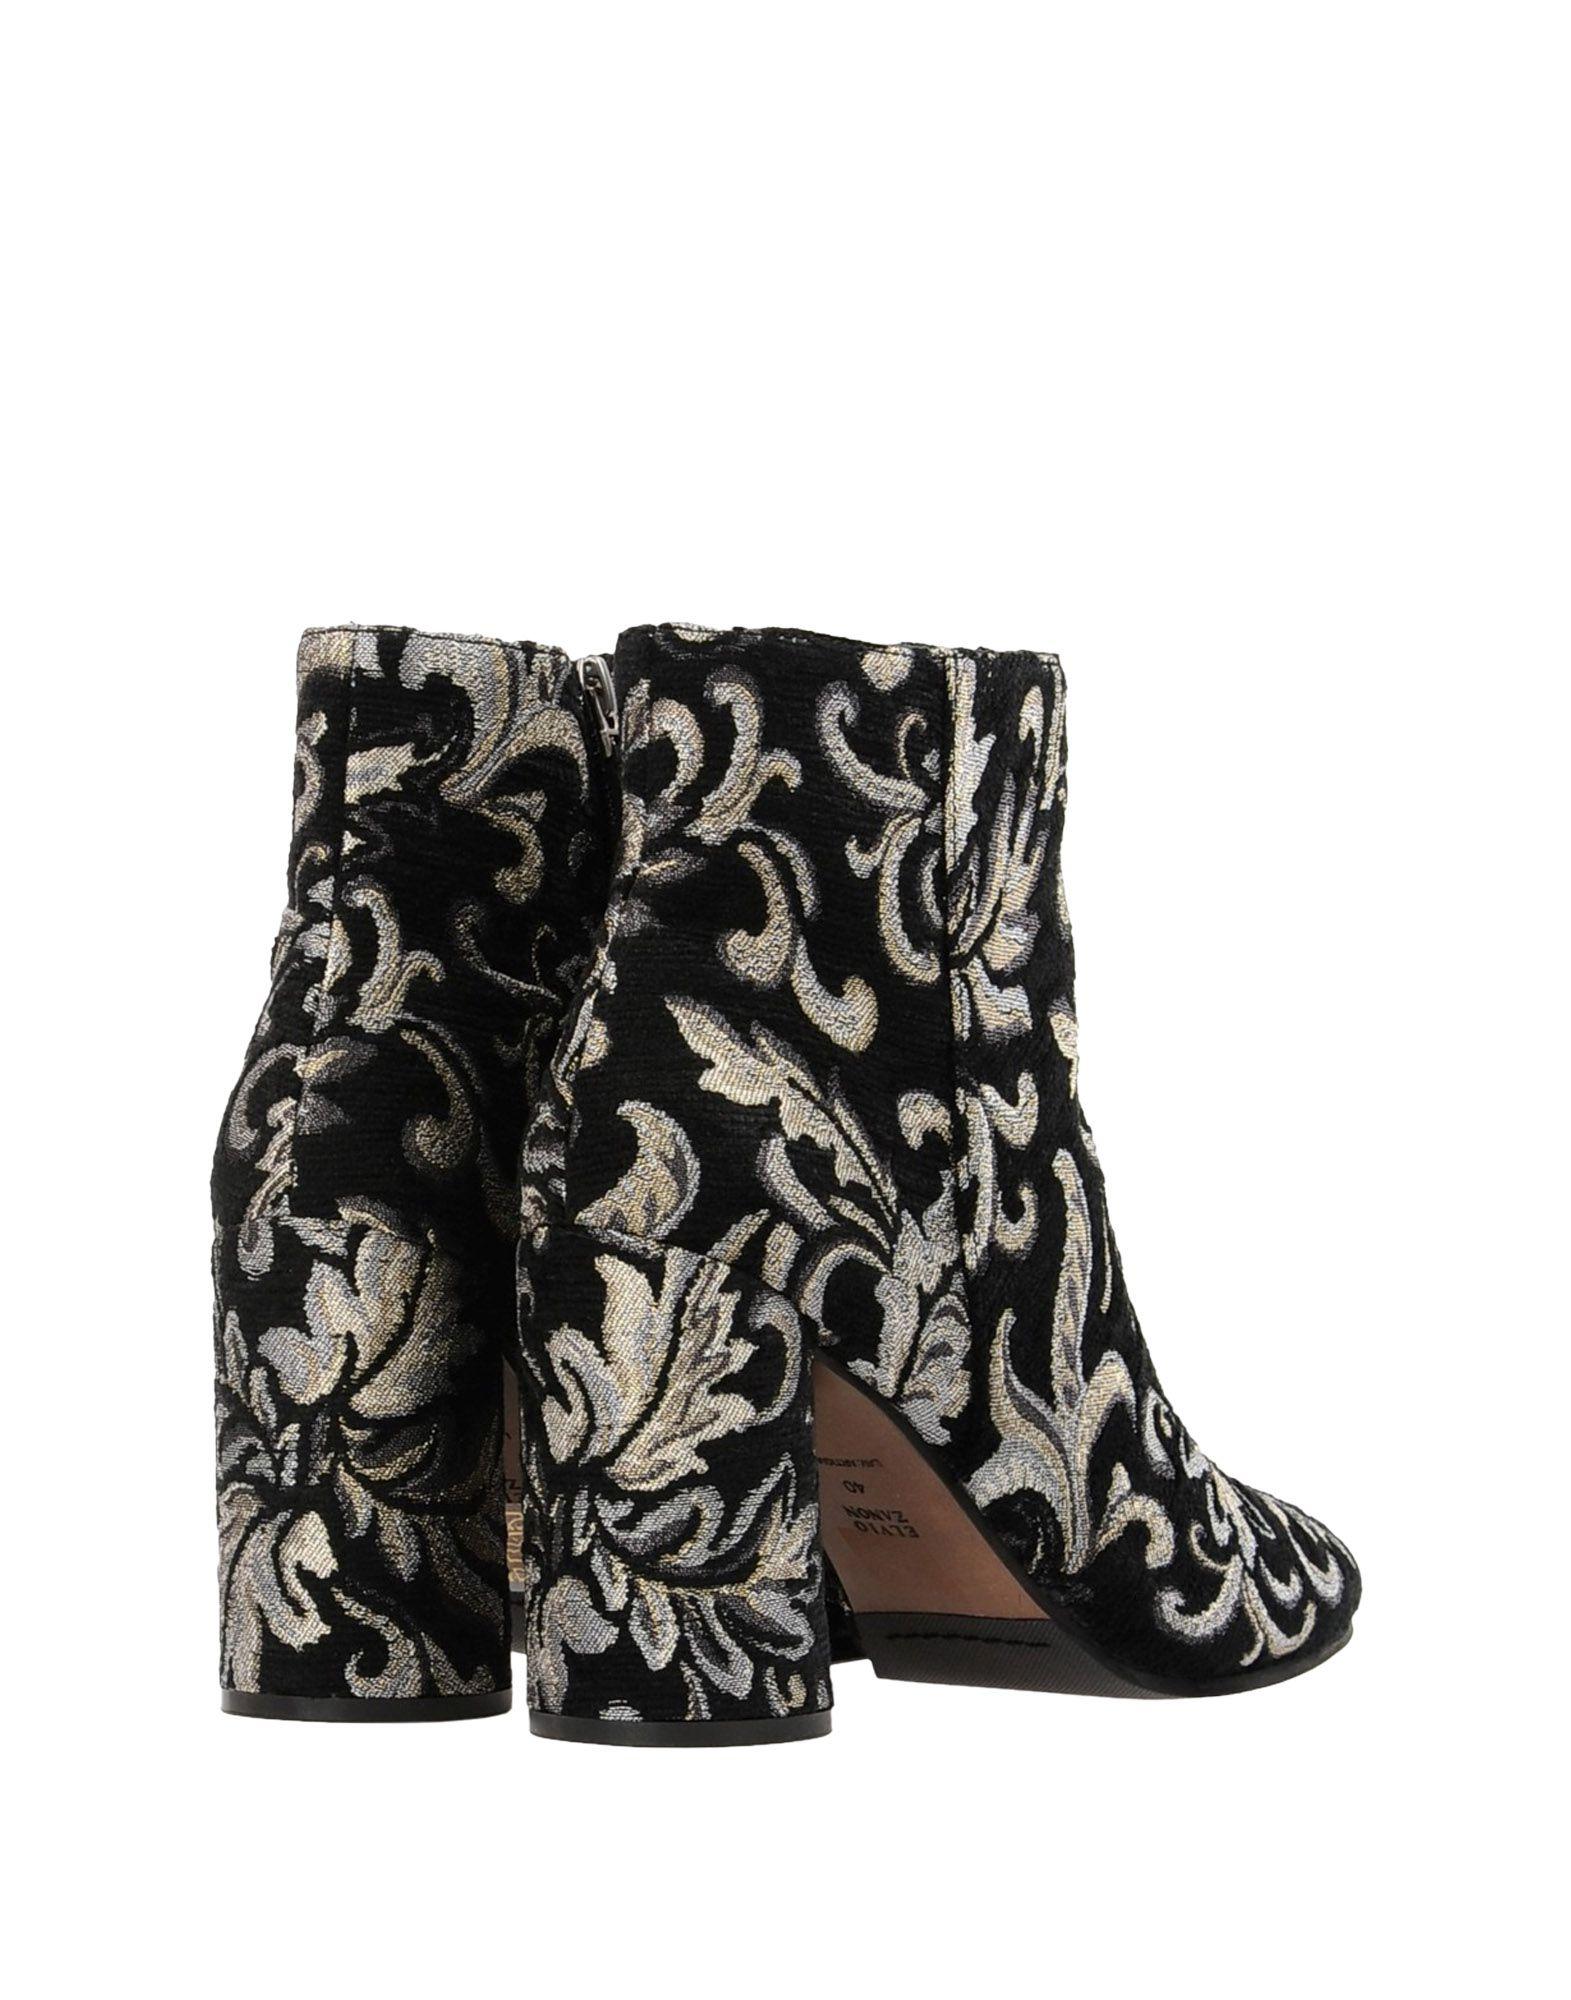 Elvio Zanon Ankle Boot - Women Women Women Elvio Zanon Ankle Boots online on  United Kingdom - 11337423QO a3f33d